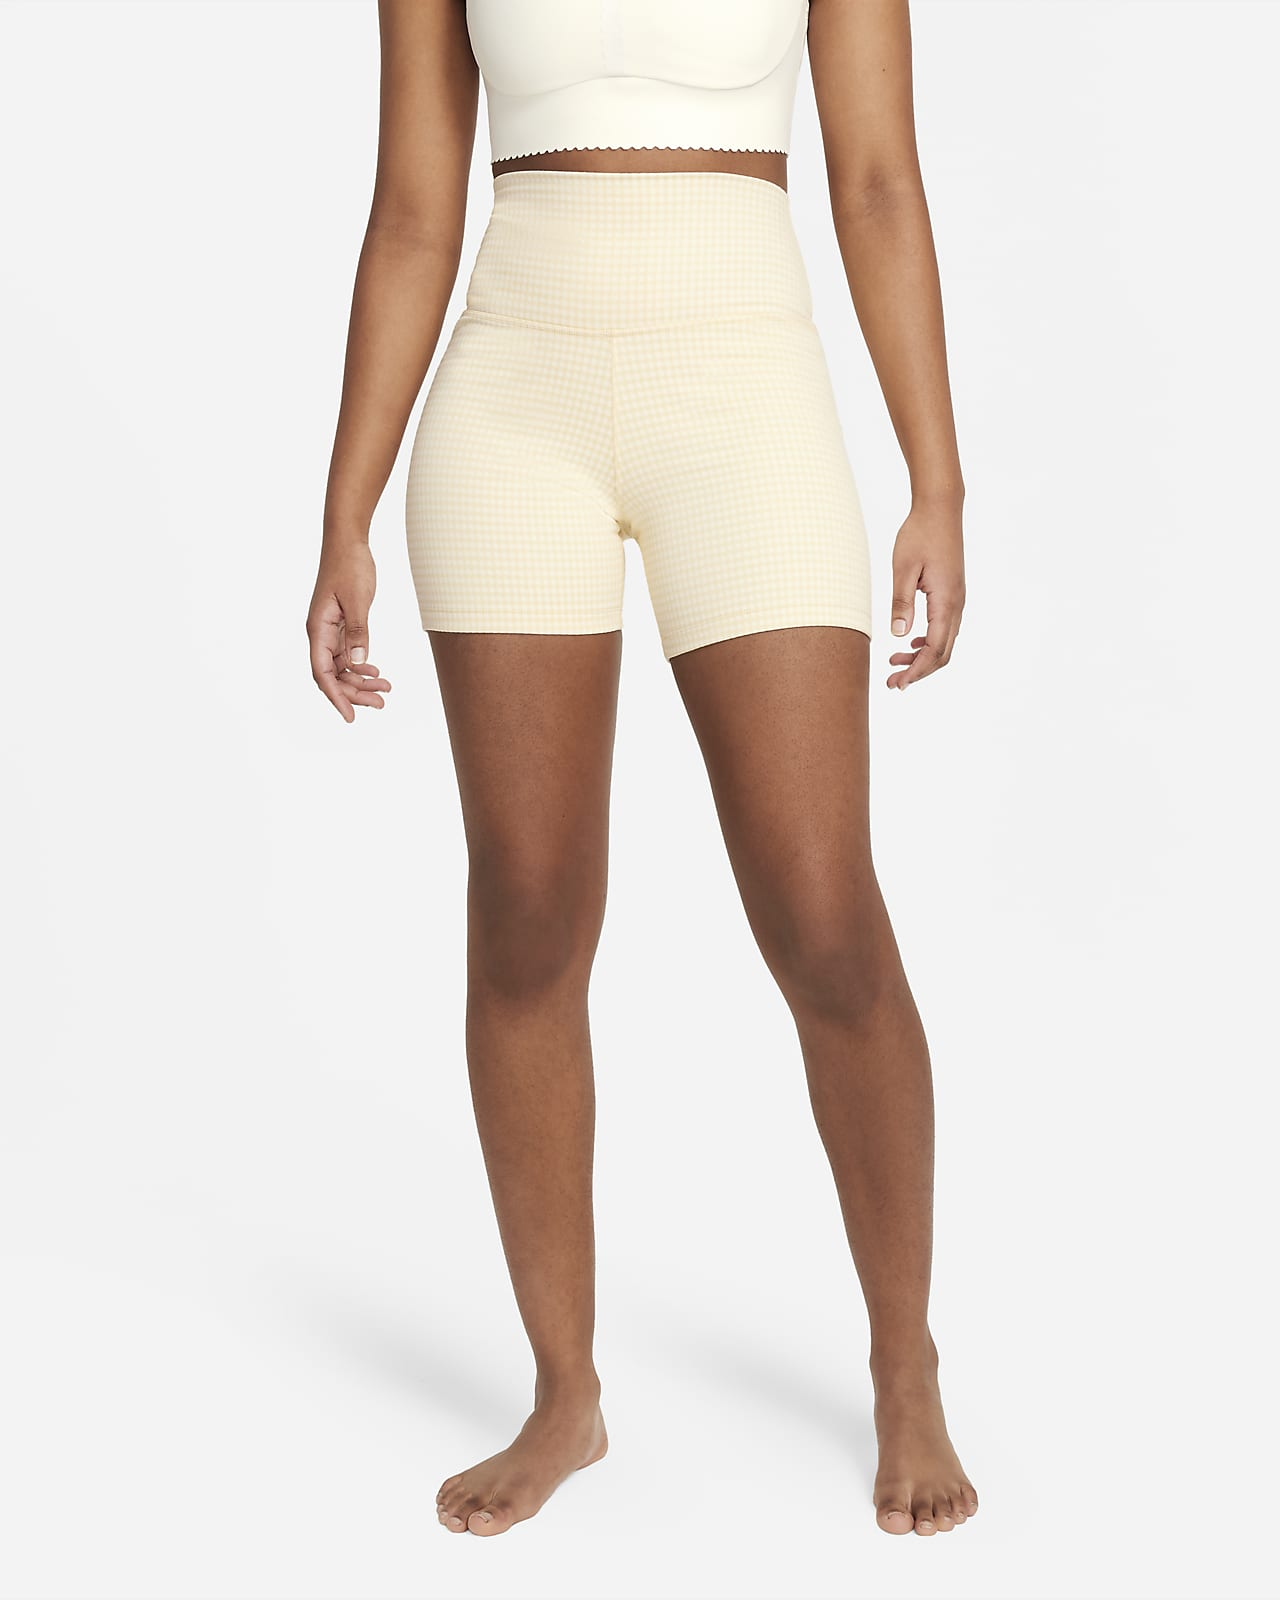 Nike Yoga Women's Gingham Shorts